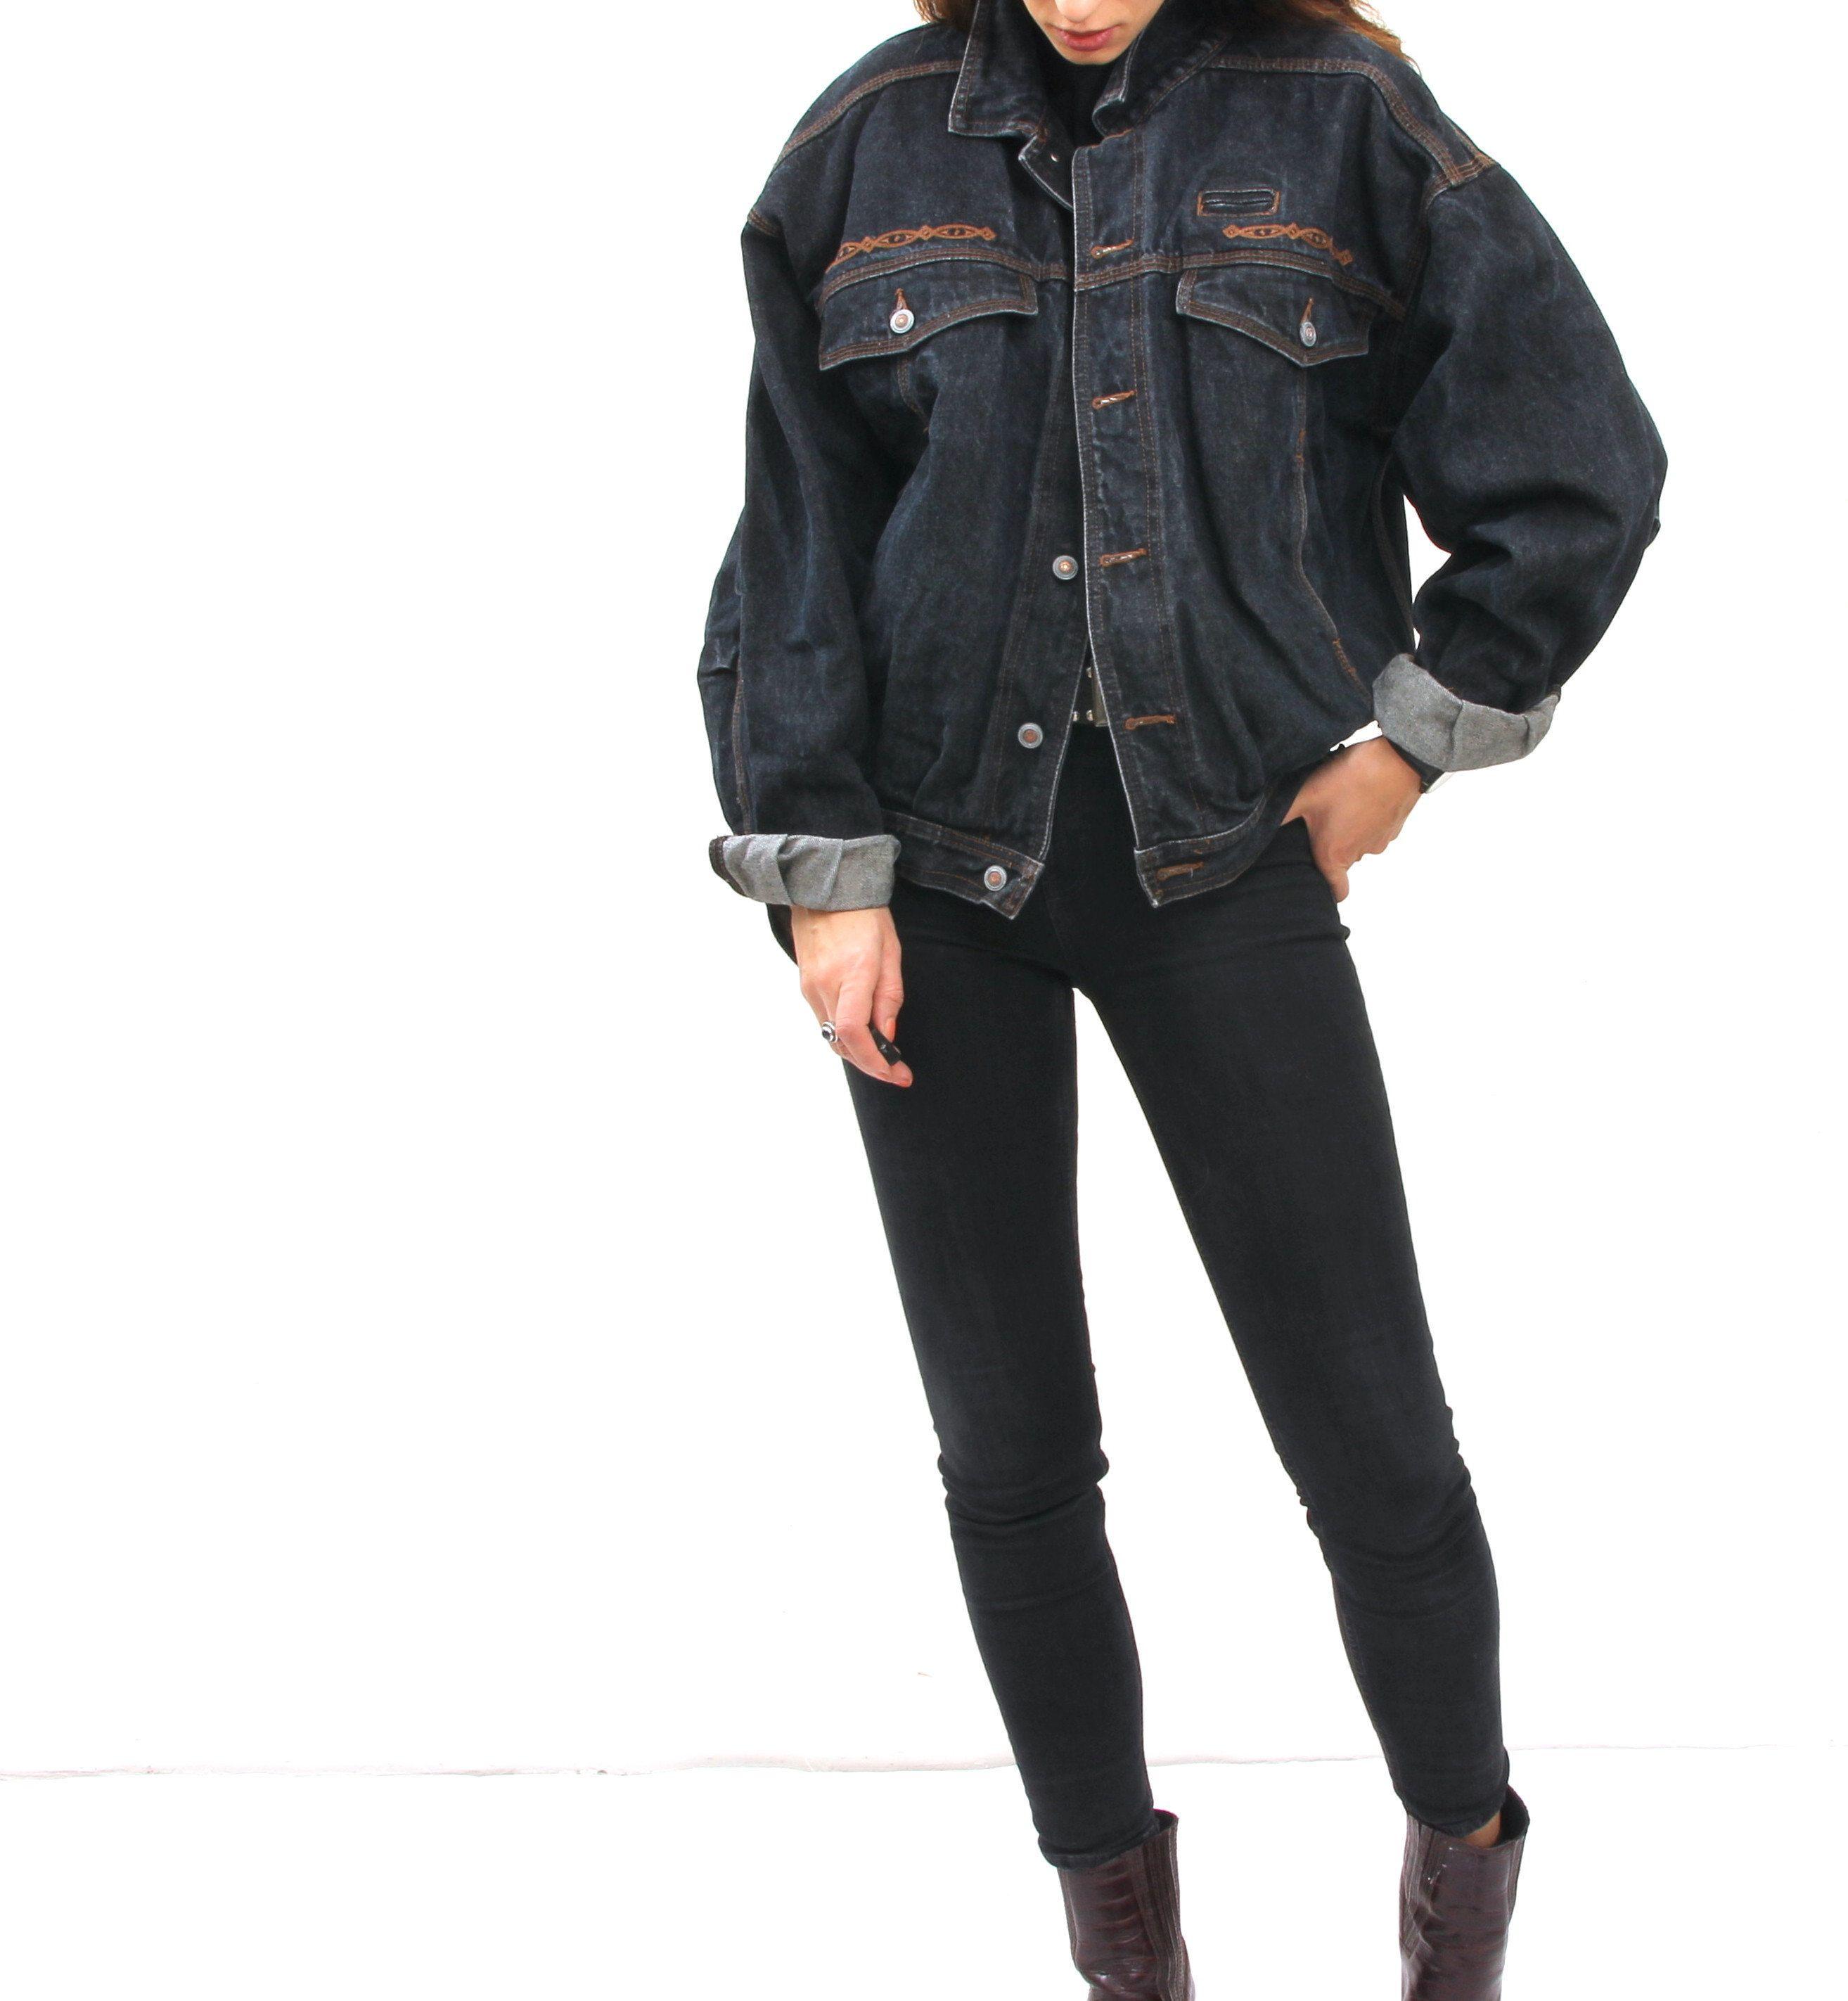 Vintage Black Oversized Jean Jacket Western Embroidered Jacket Etsy Oversized Jean Jacket Embroidered Jacket Jackets [ 2845 x 2628 Pixel ]